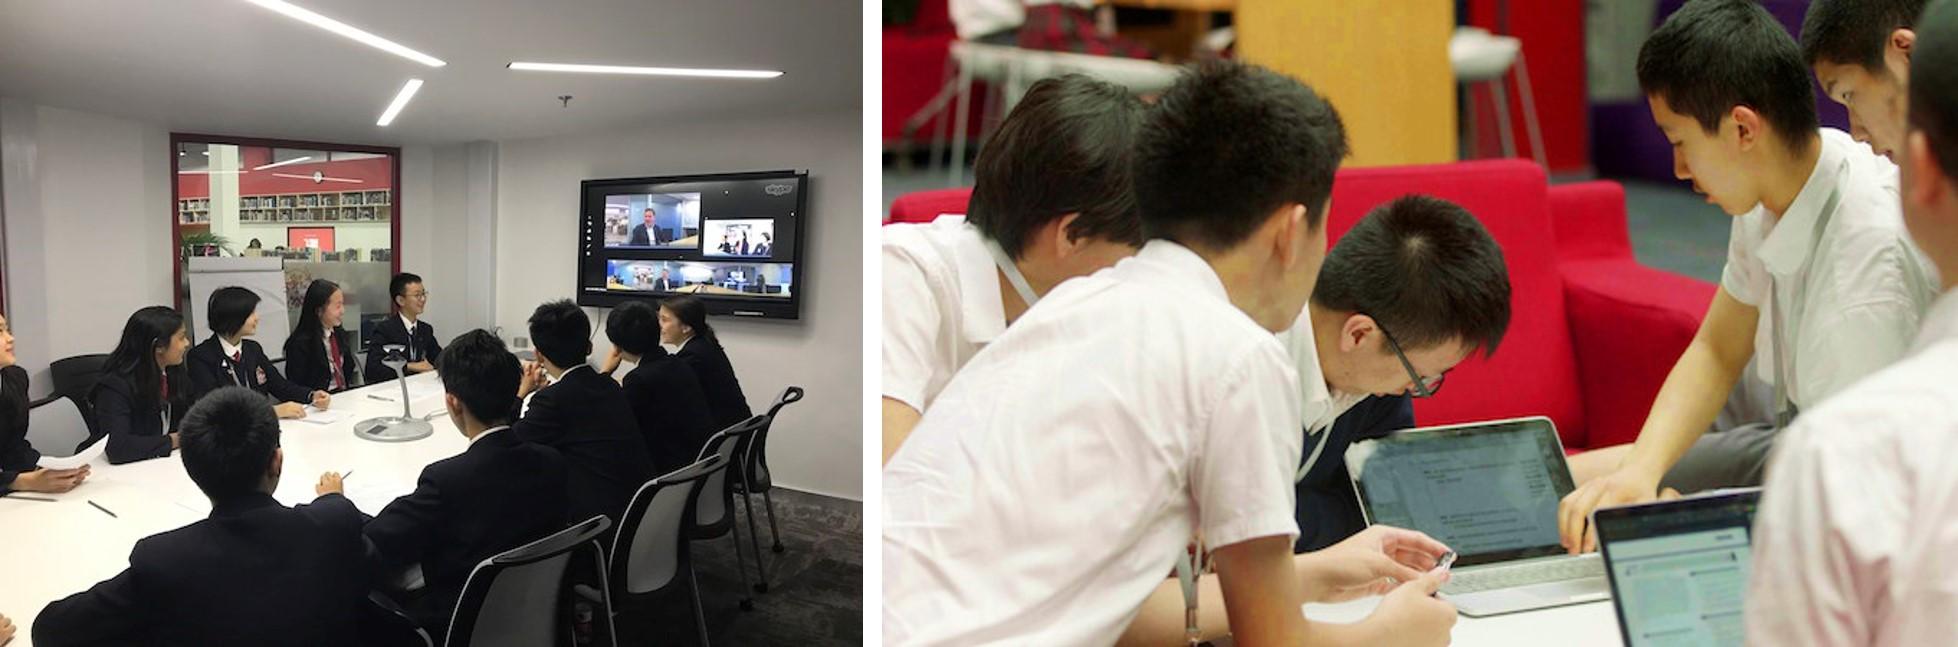 igcse-programme-student-discussing-北京德威英国国际学校